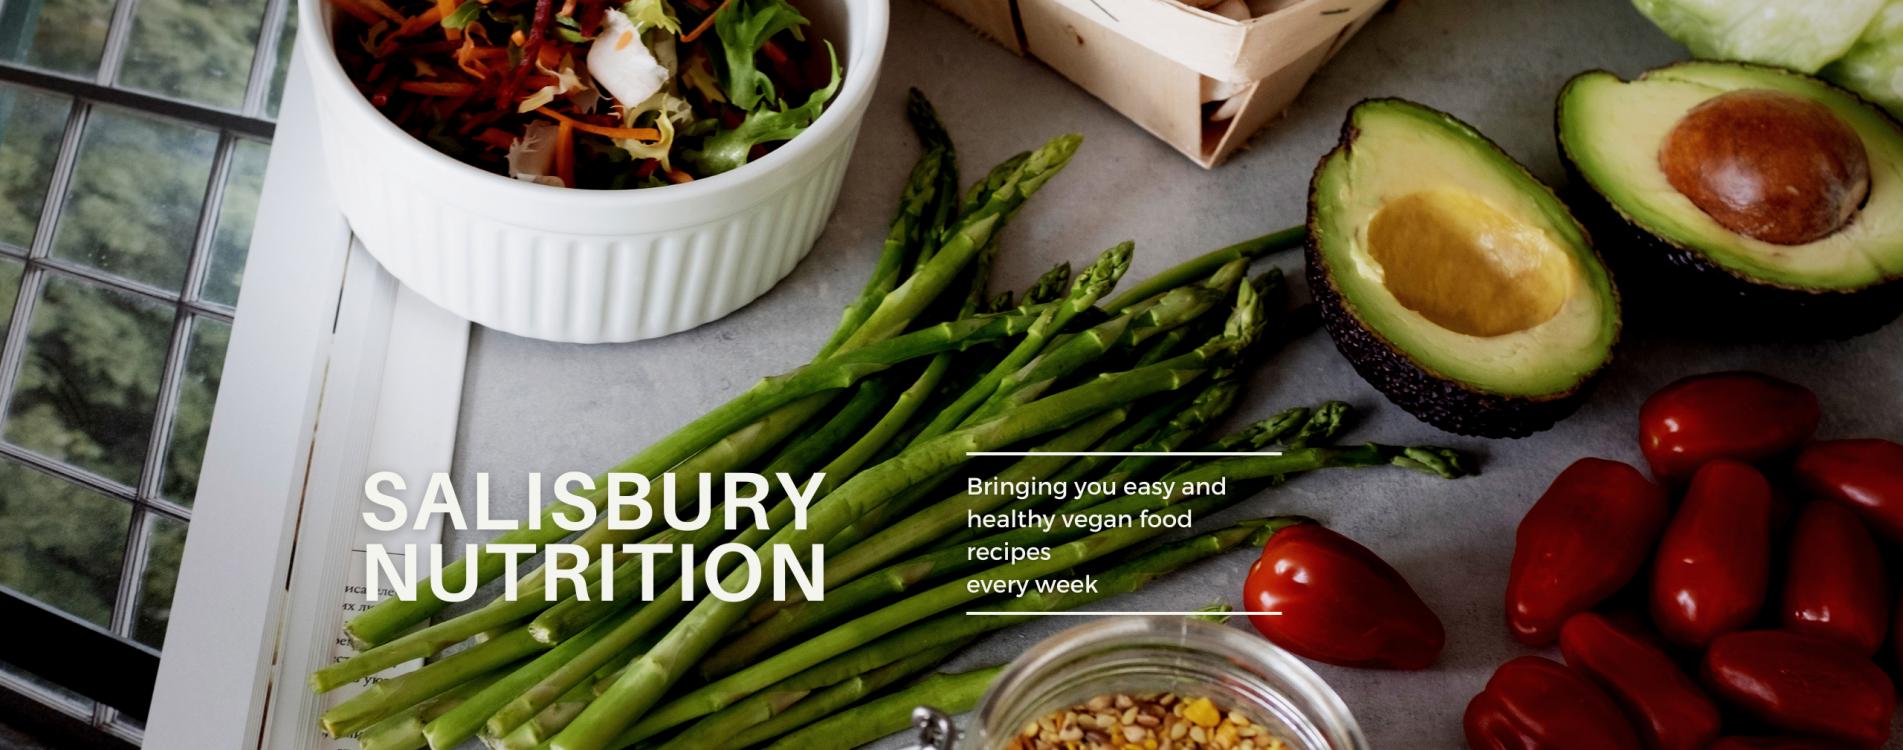 Salisbury Nutrition